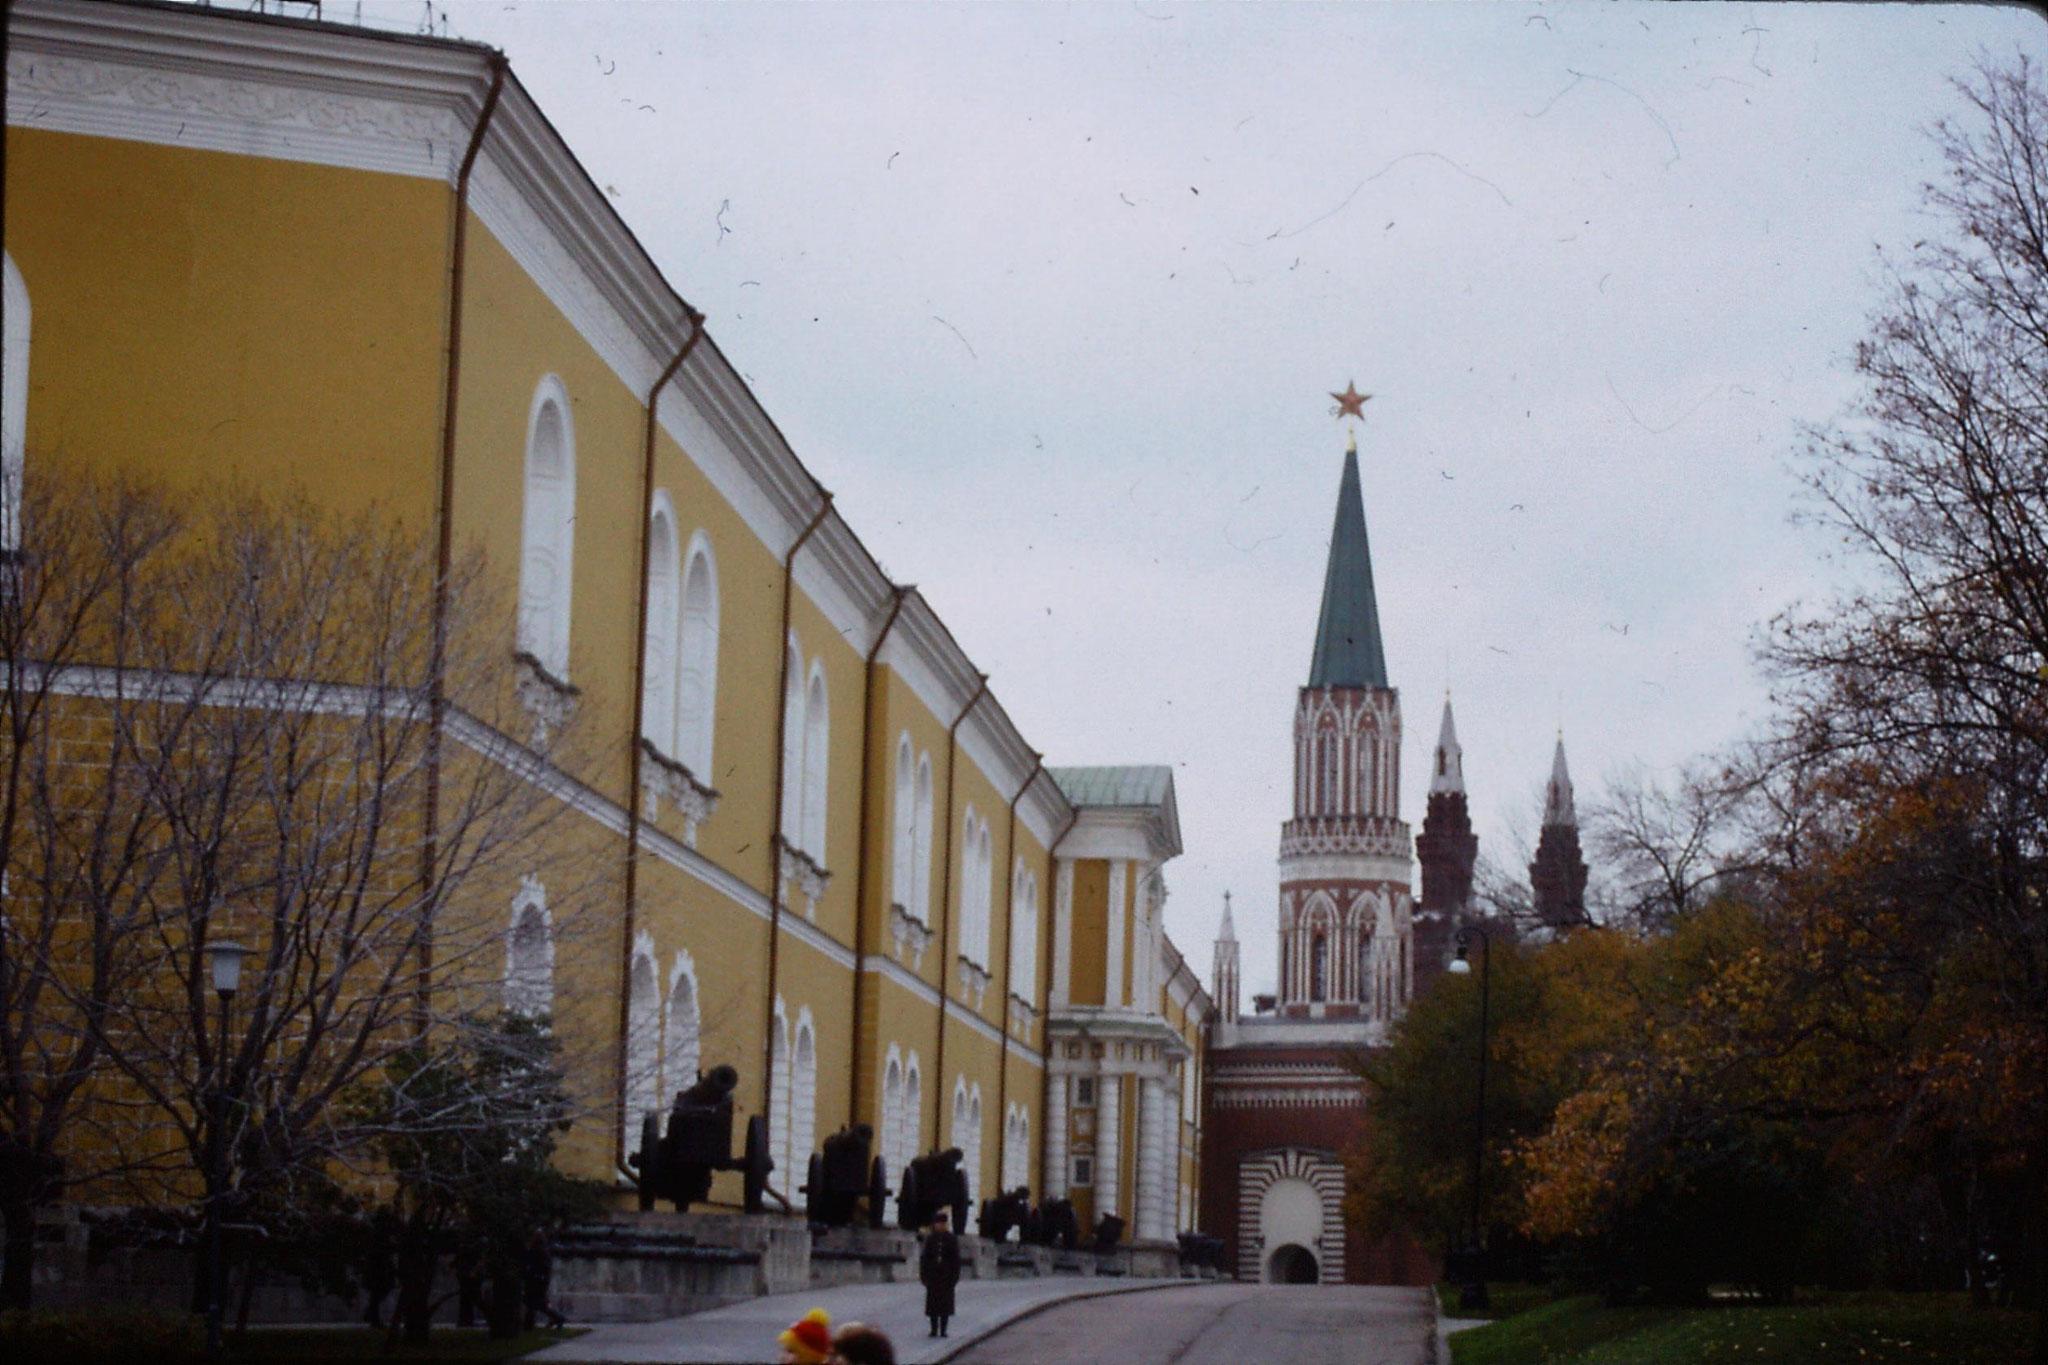 17/10/1988: 7: Kremlin, arsenal